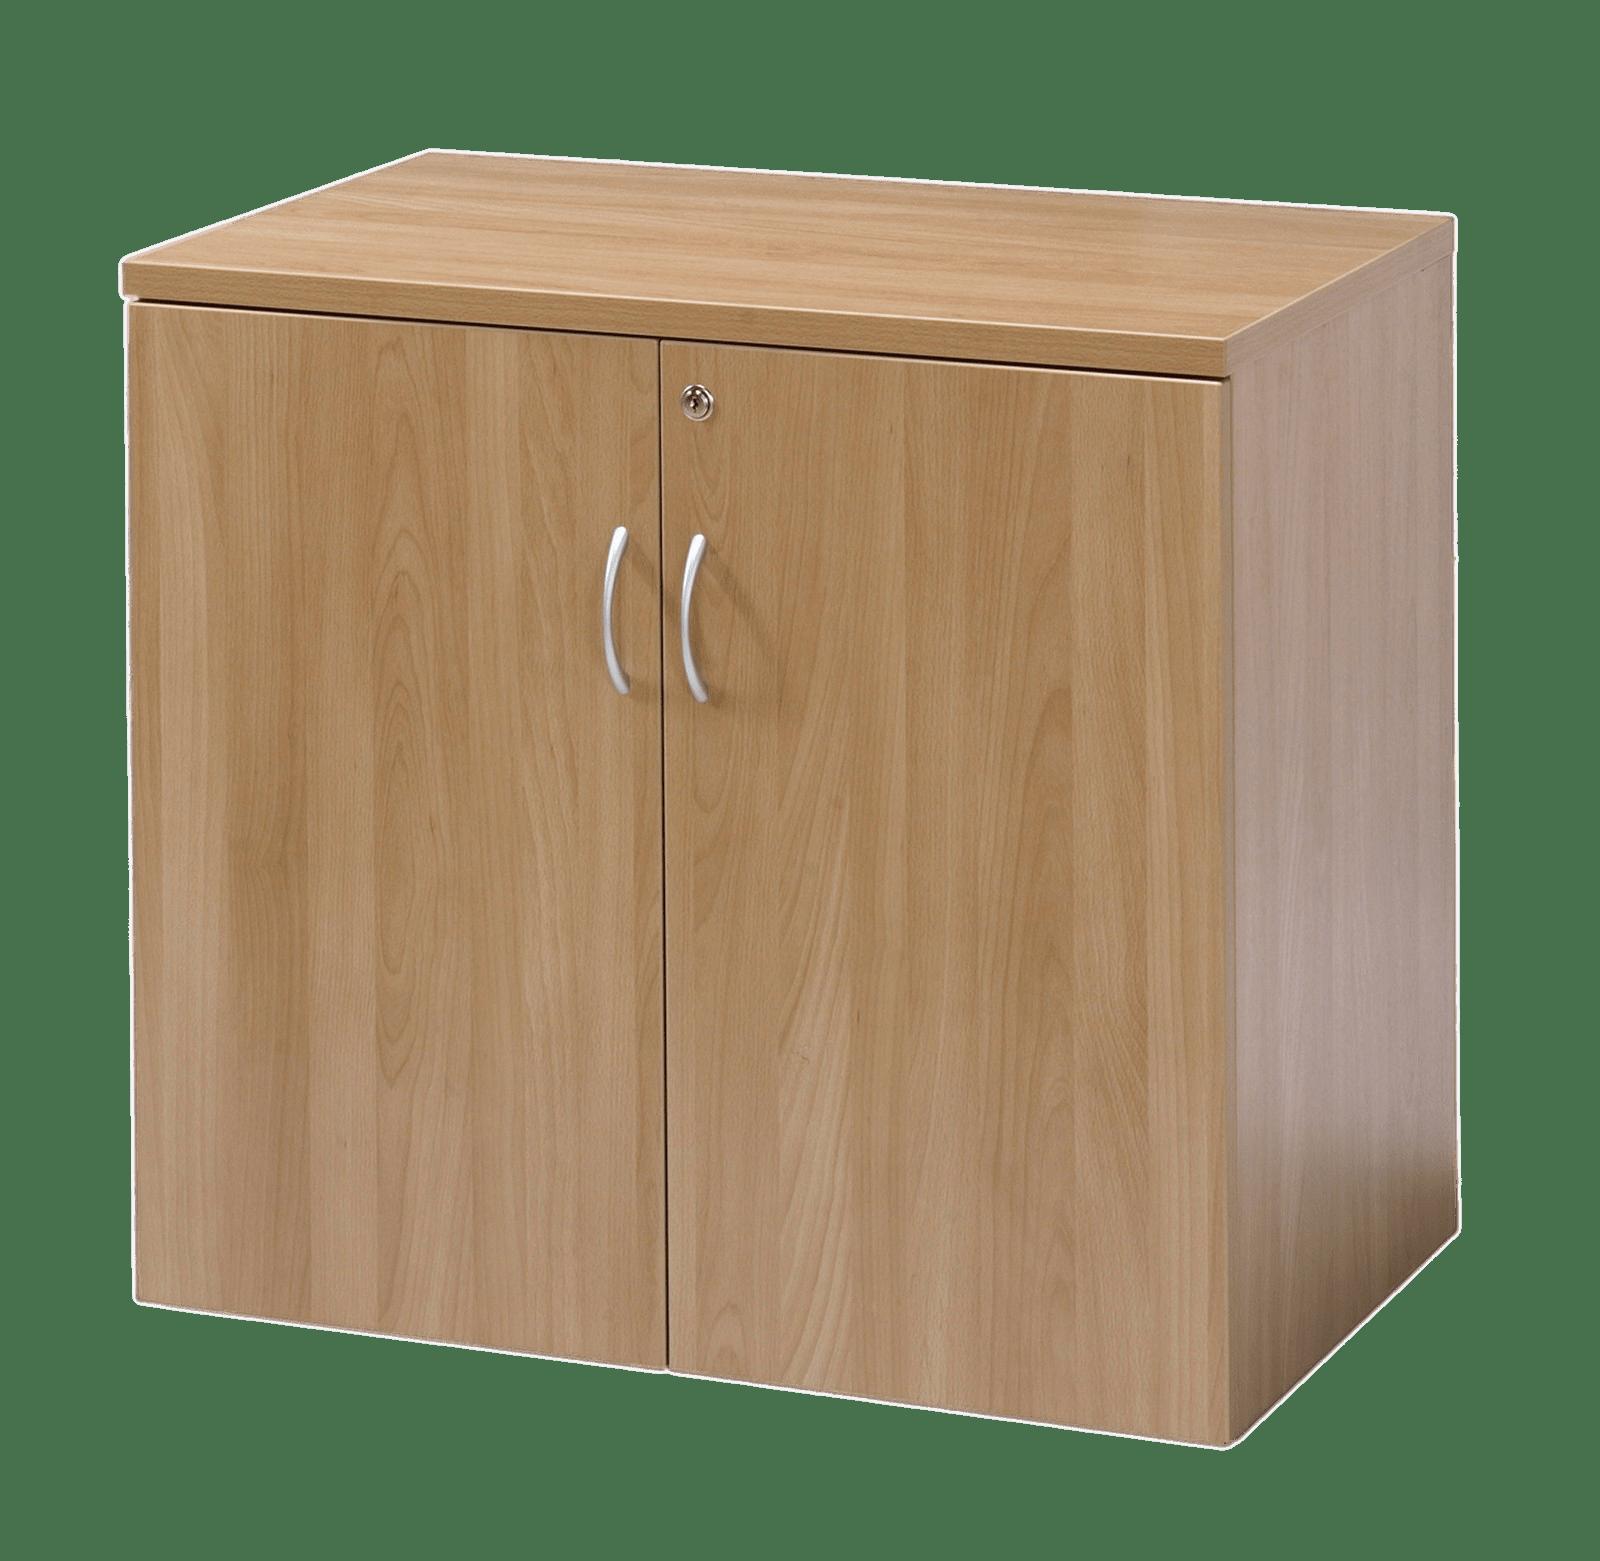 Dresser clipart cubboard. Wooden office cupboard transparent